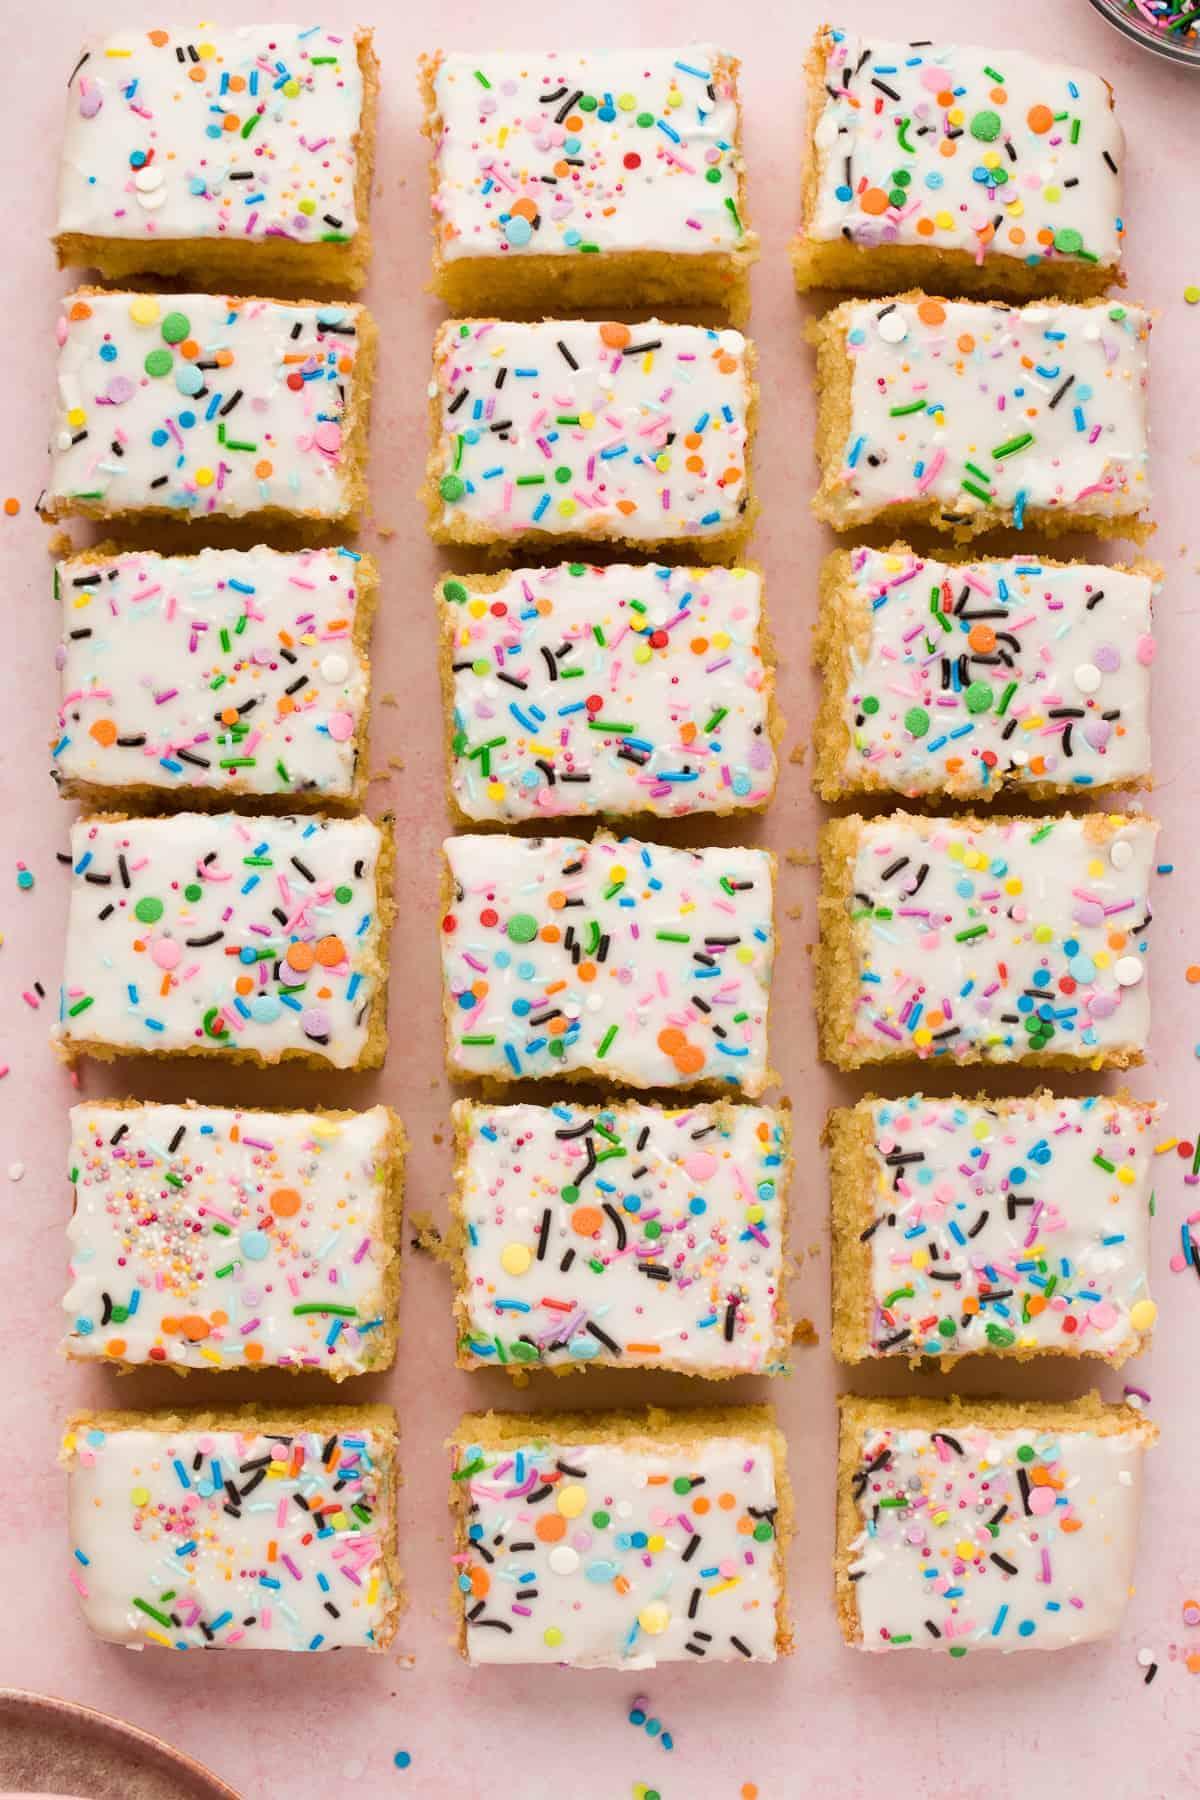 Individual slices of Old School Sprinkle Cake.